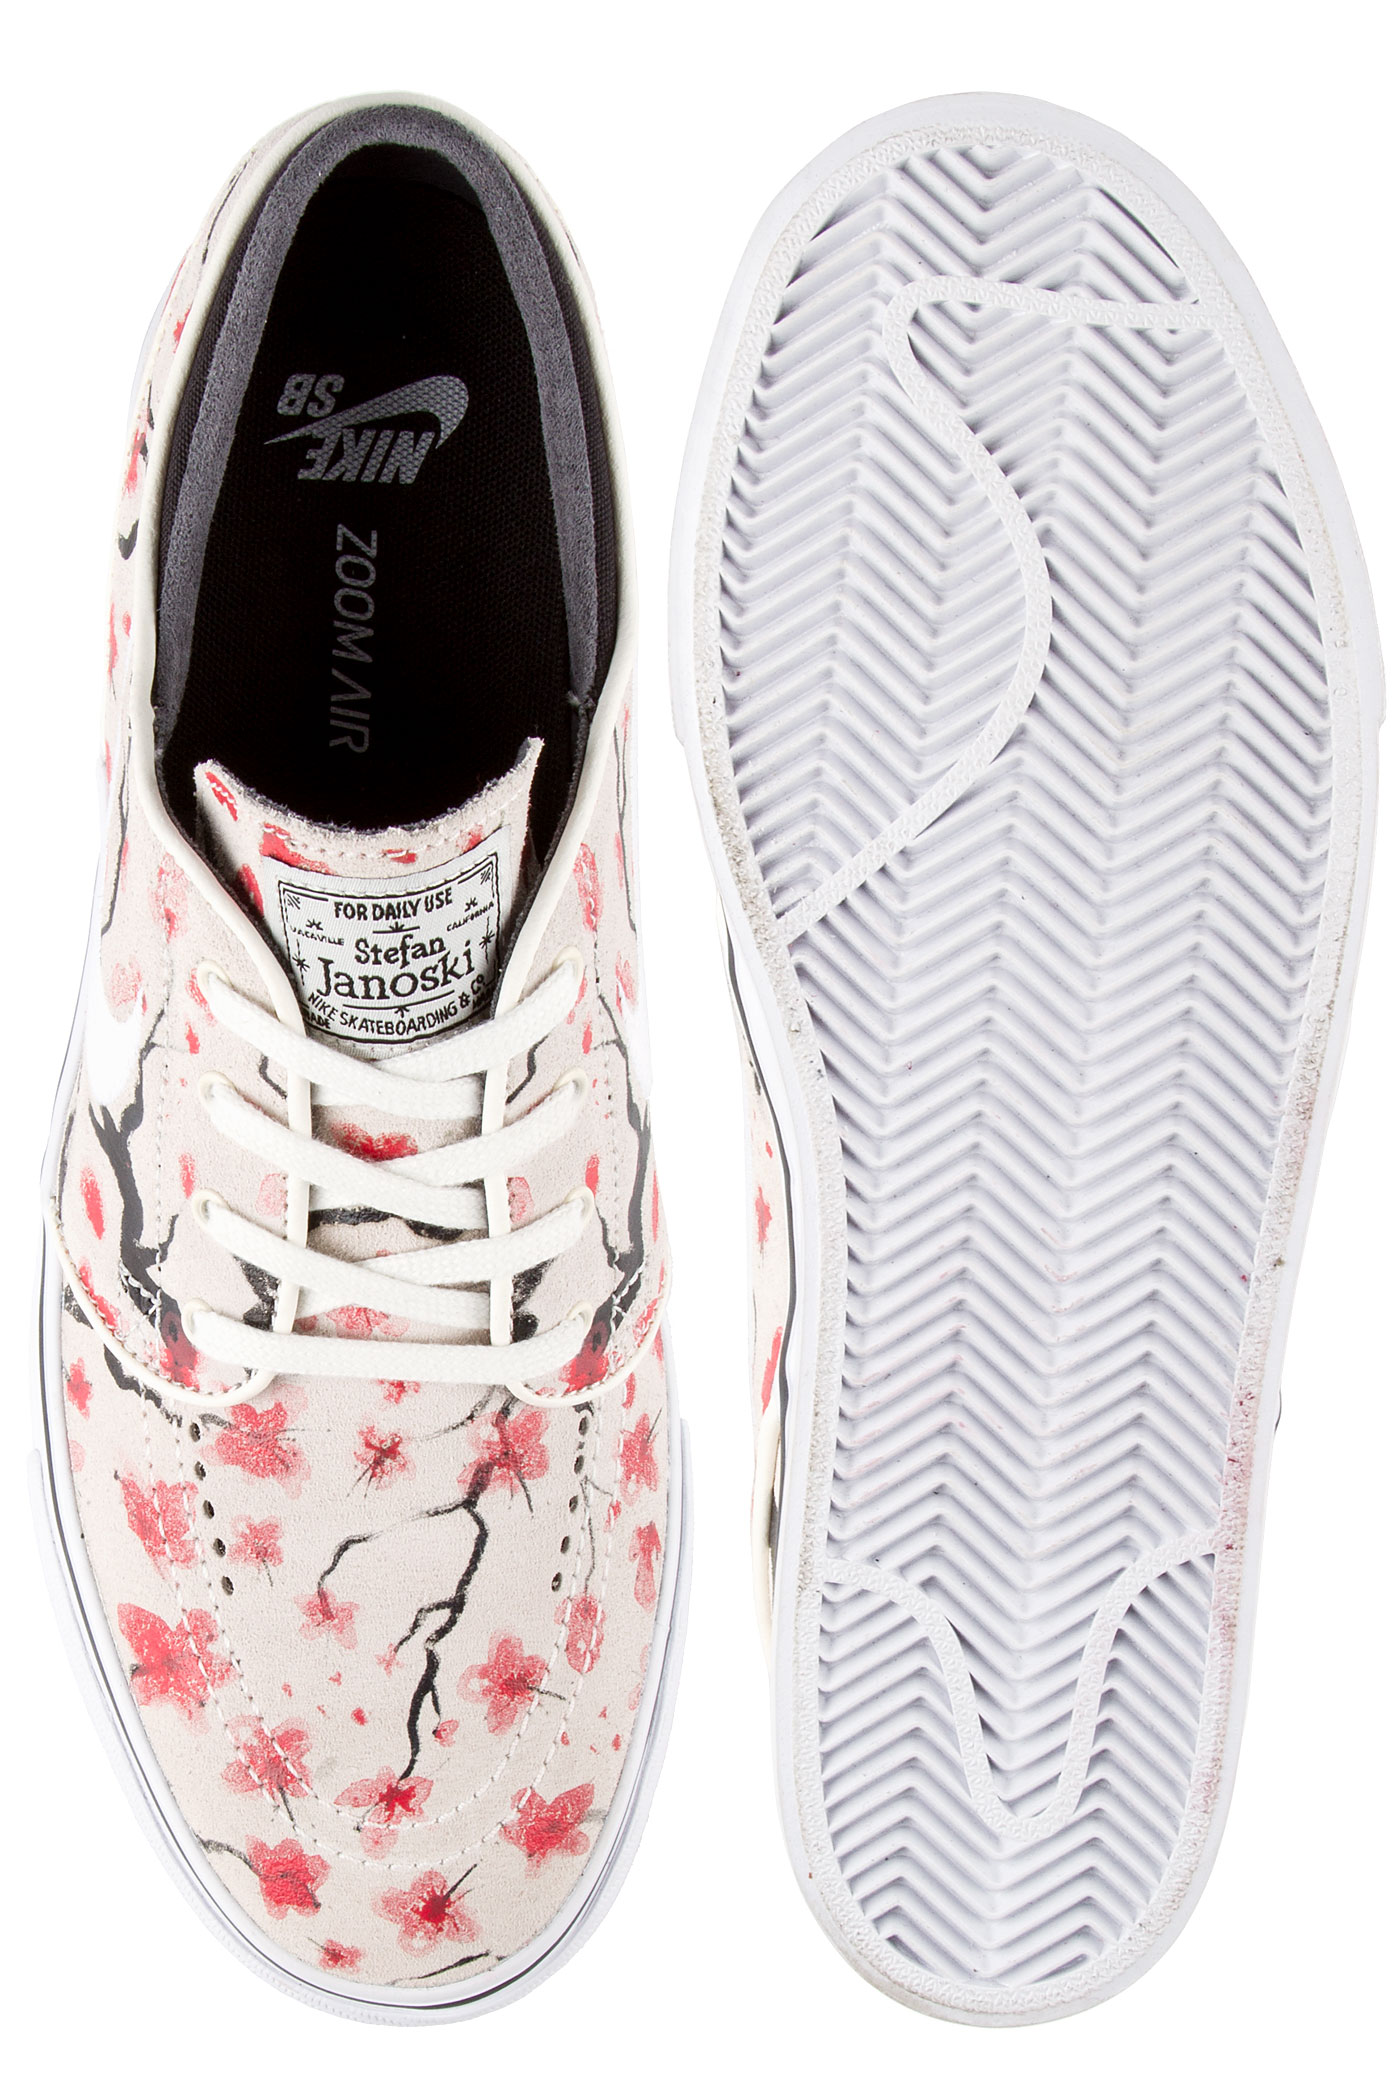 Nike SB Zoom Stefan Janoski Elite Shoe (cherry blossom) buy at ... 875678be7afd